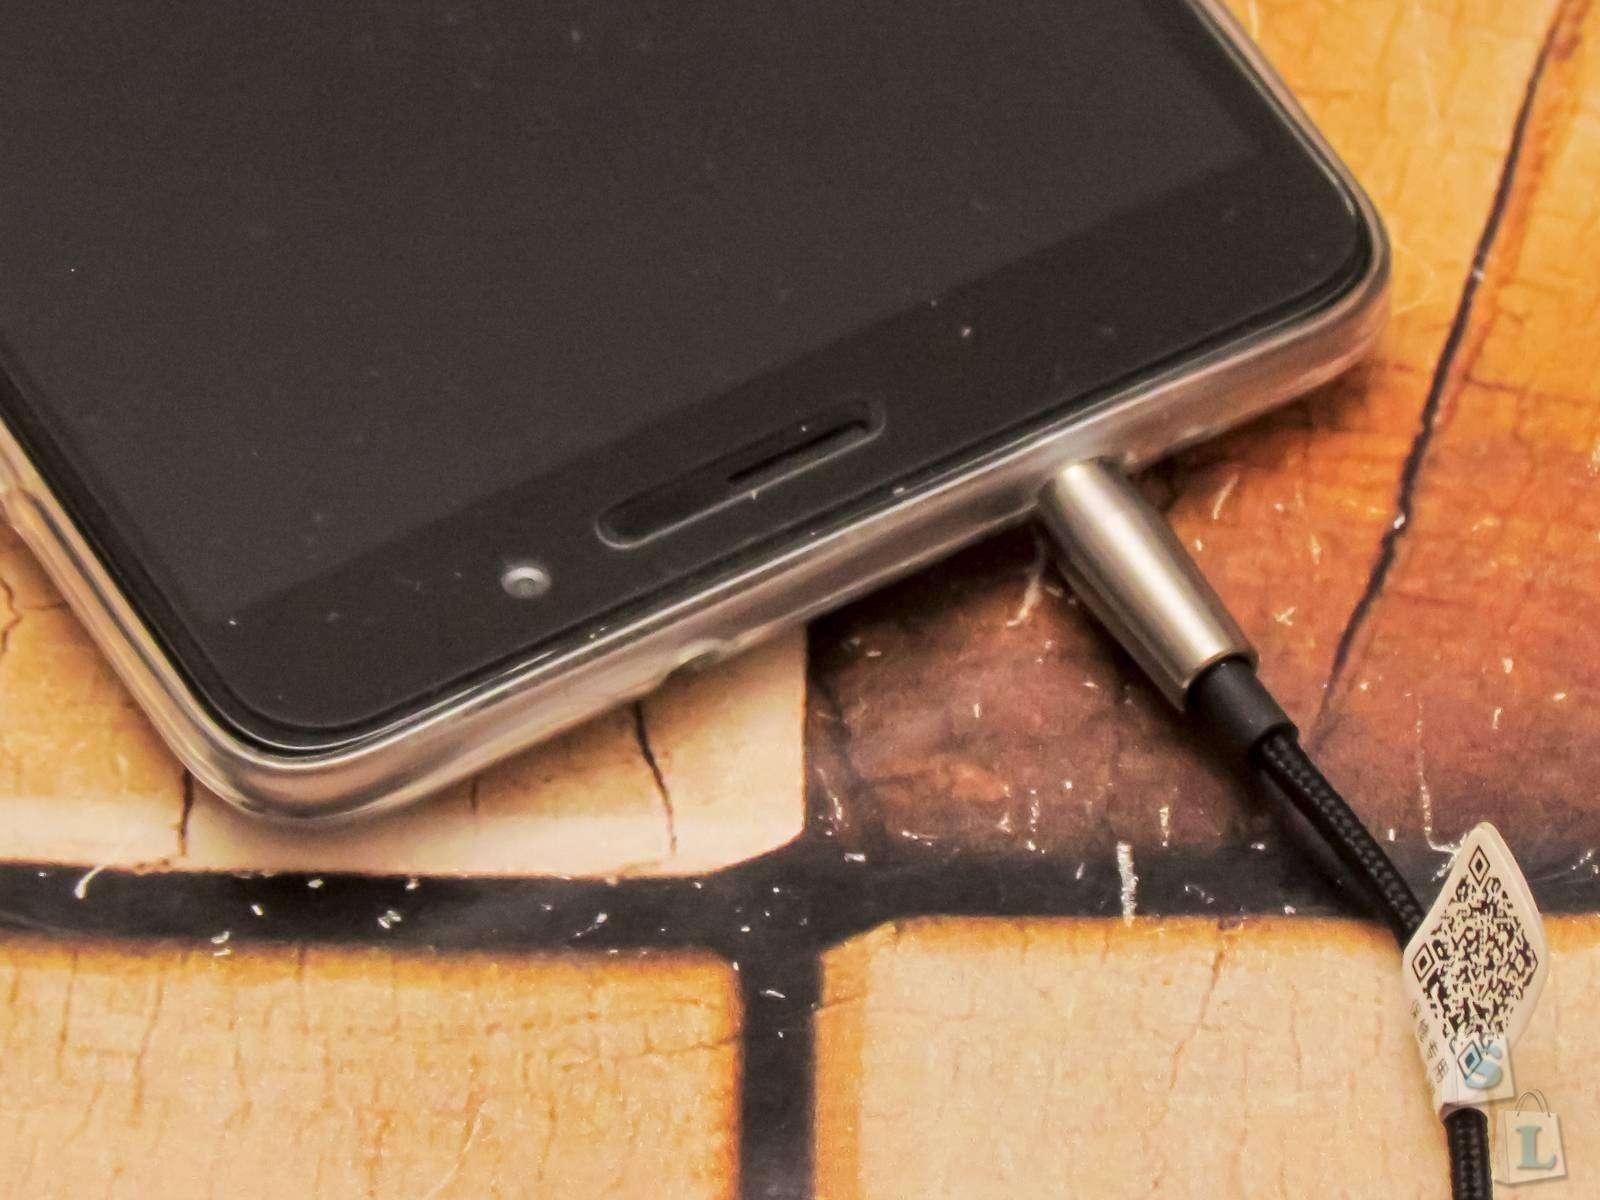 GearBest: Обзор гарнитуры Xiaomi Hybrid Dual Drivers